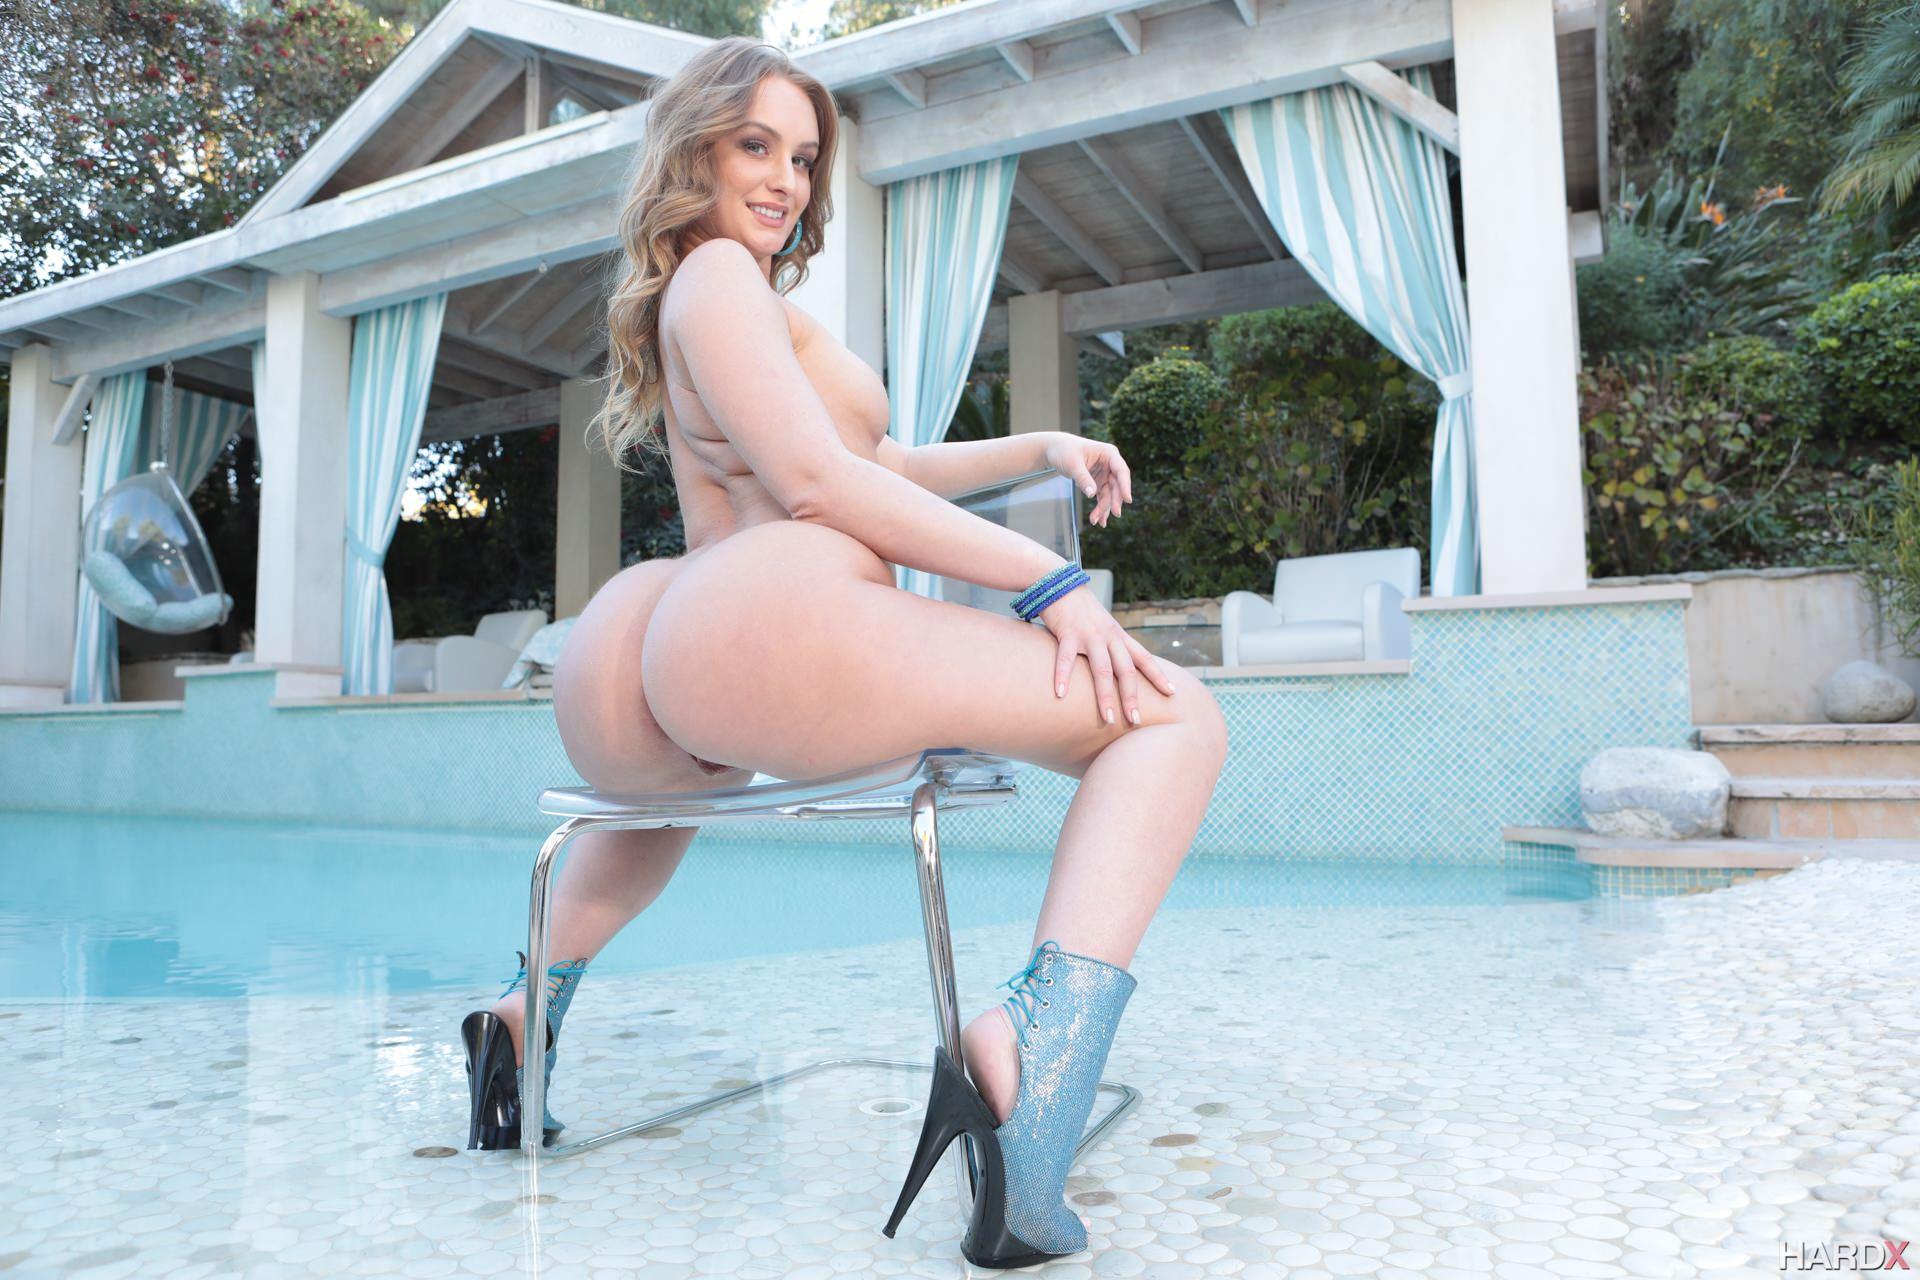 daisy-stone-big-butt-anal-06 - shegg